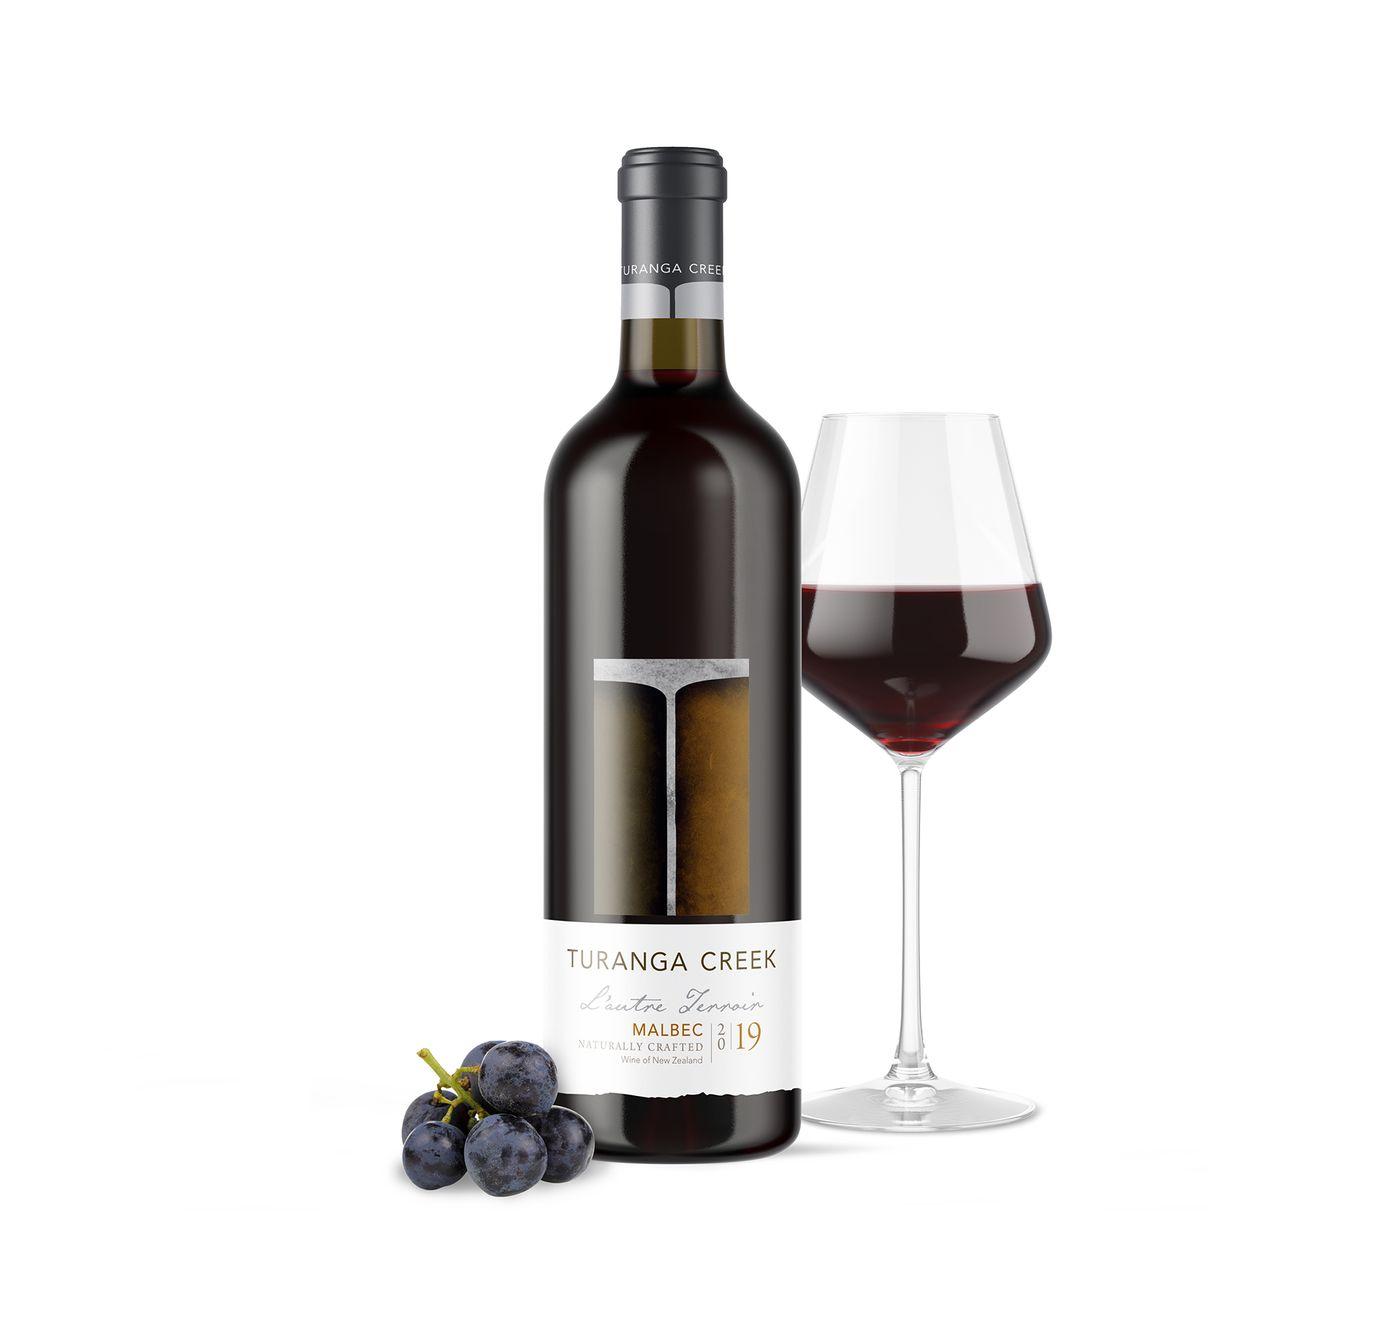 Turanga Creek Wine Reserve Malbec